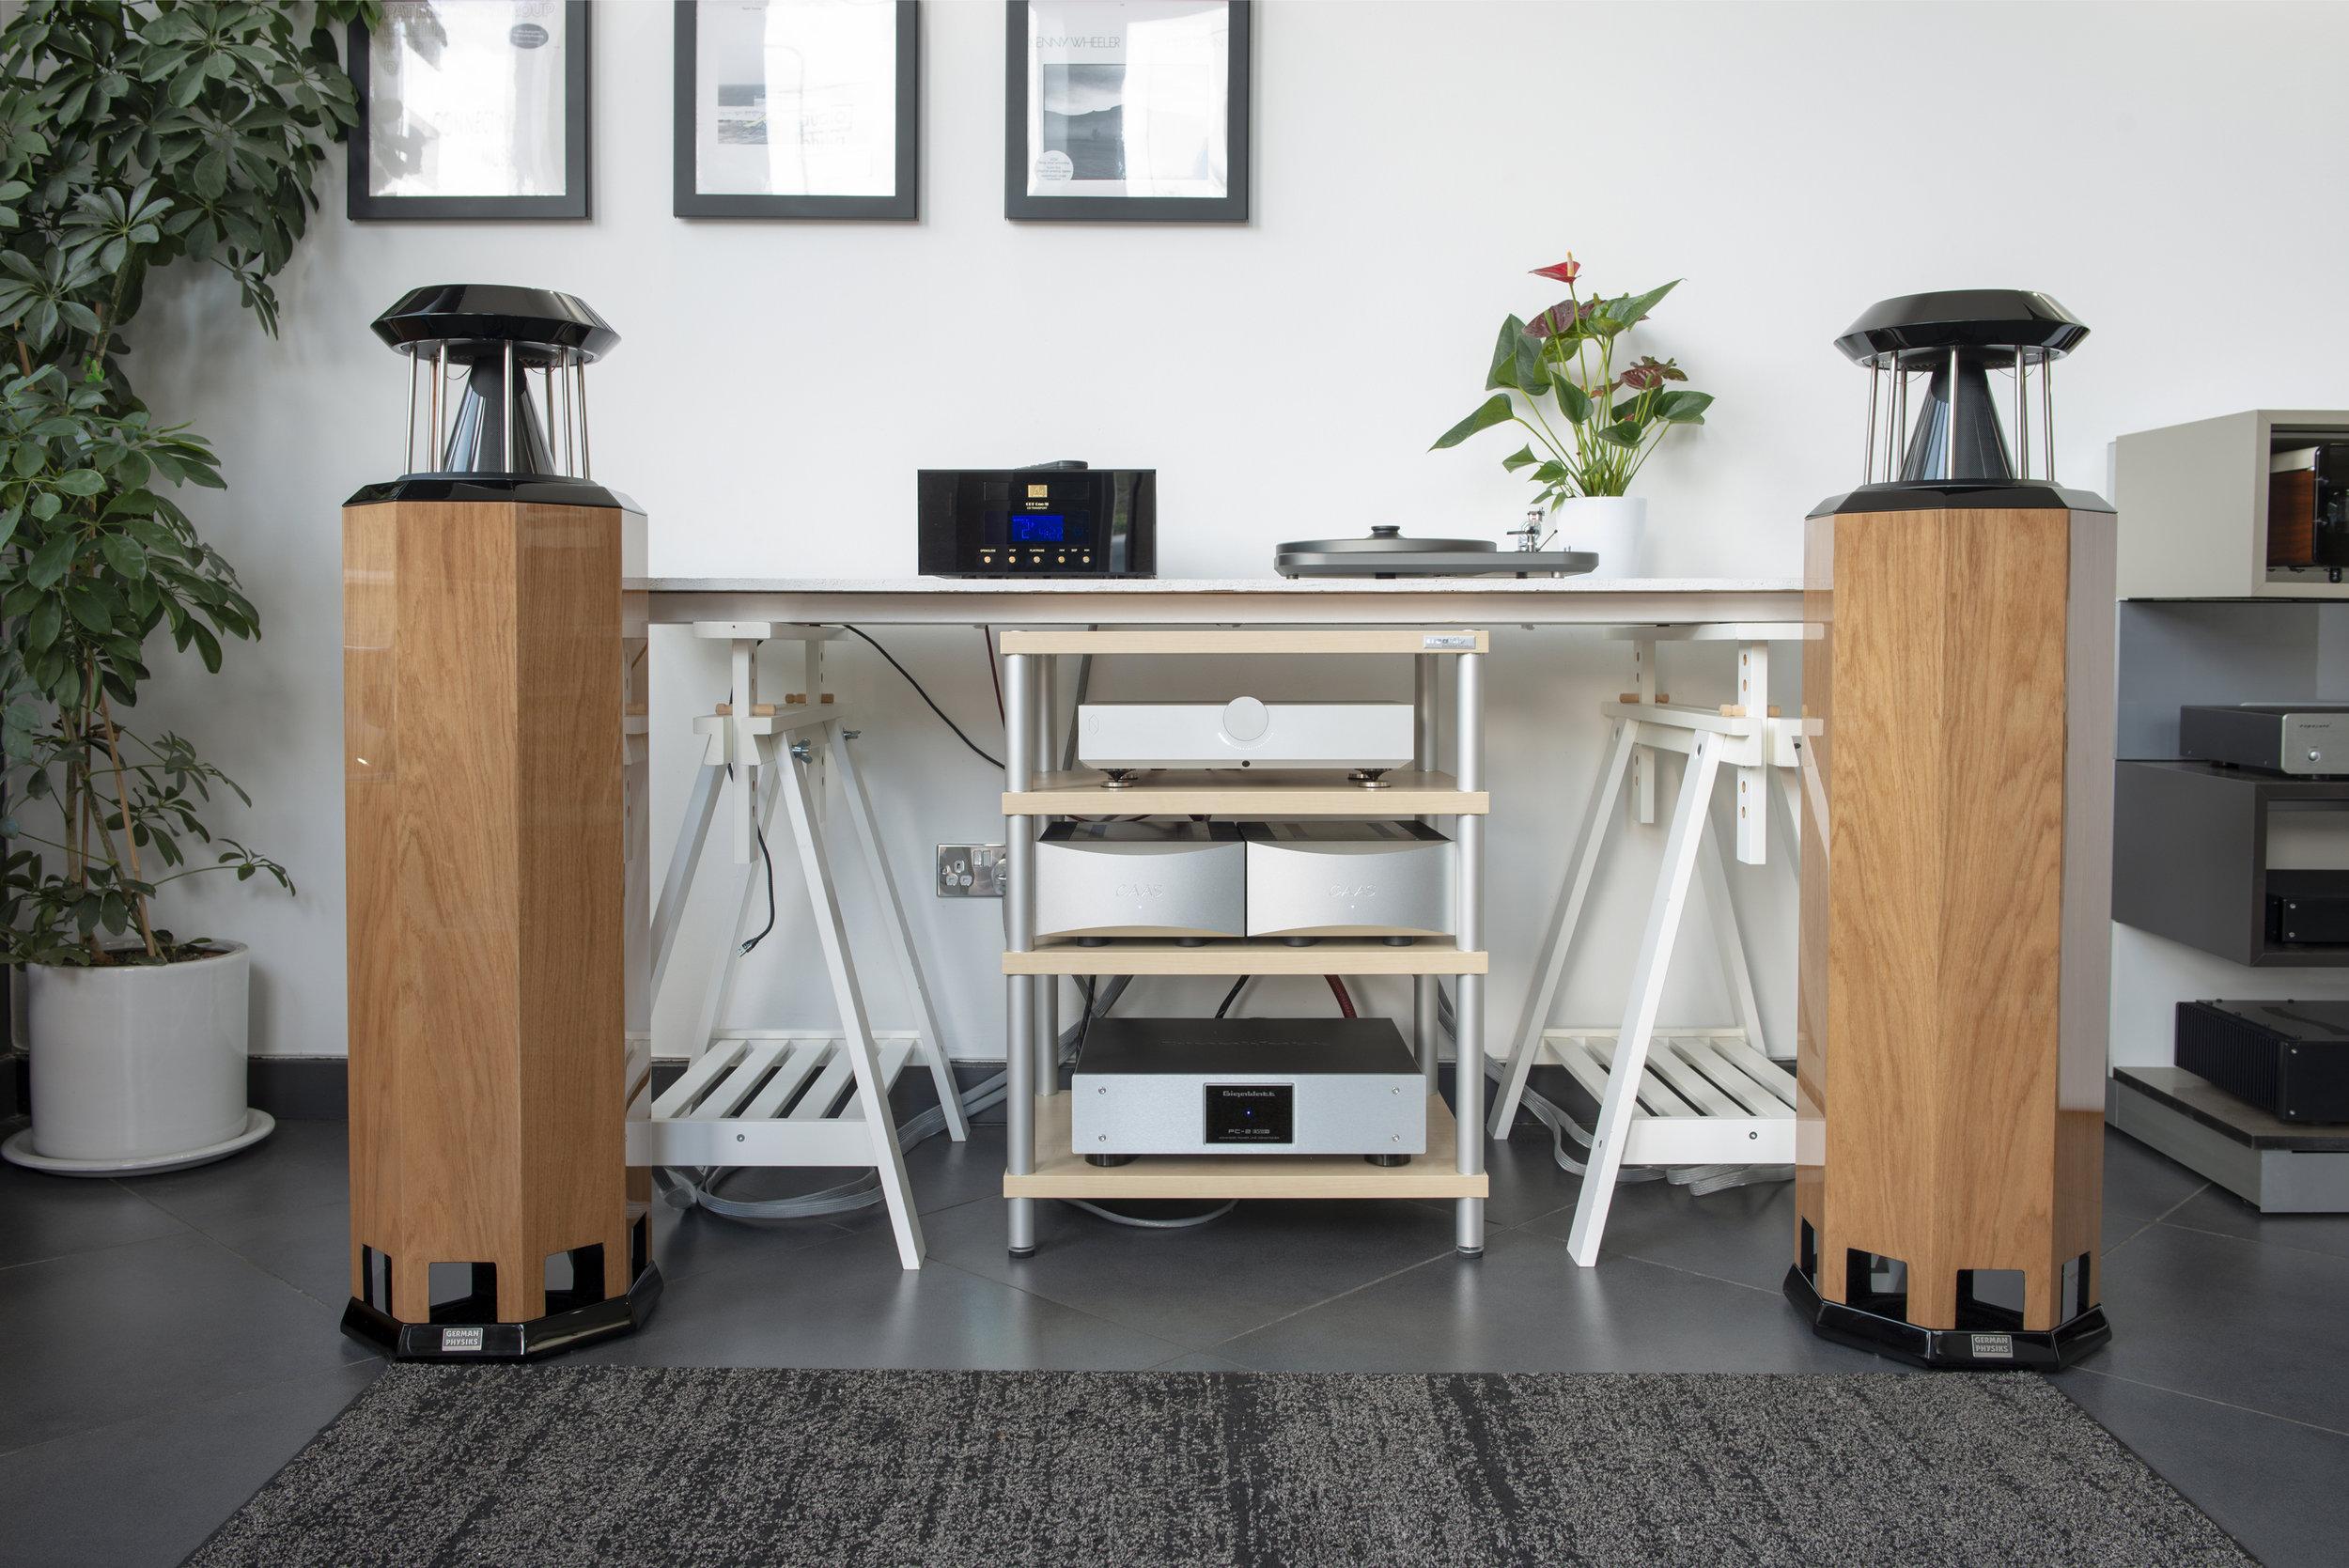 HRS-130 loudspeakers in high polish oak with CAAS Audio electronics | Audio-philia, Edinburgh, Scotland